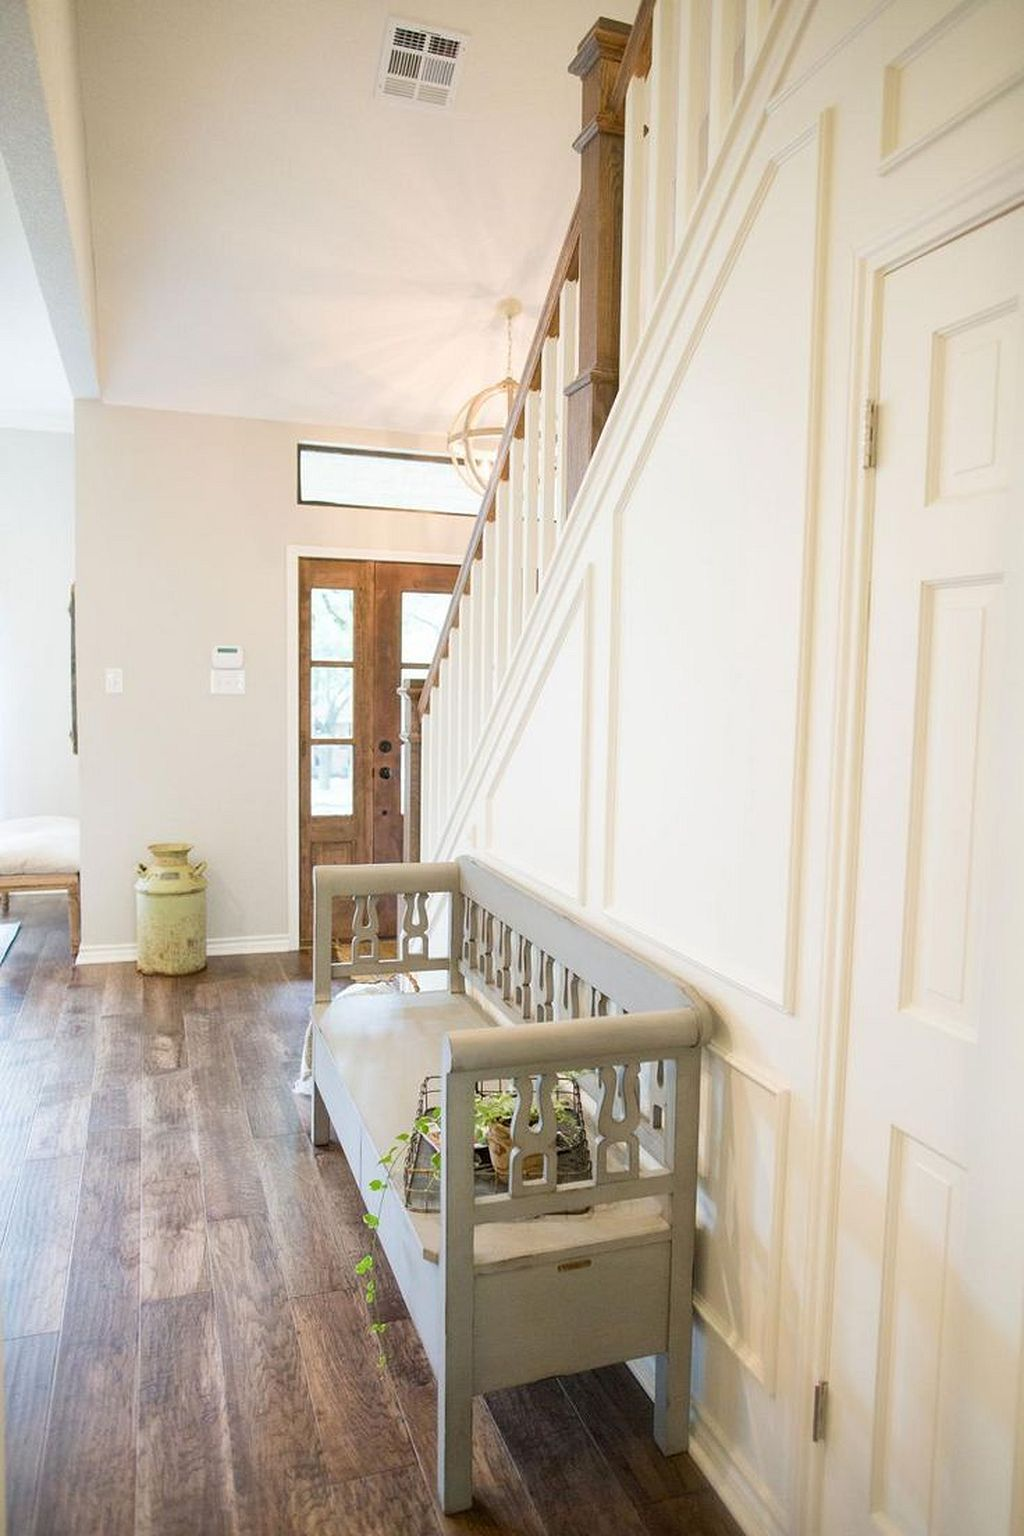 Joanna gaines hallway ideas   Cargo Ship House Fixer Upper Ideas  House and Interiors